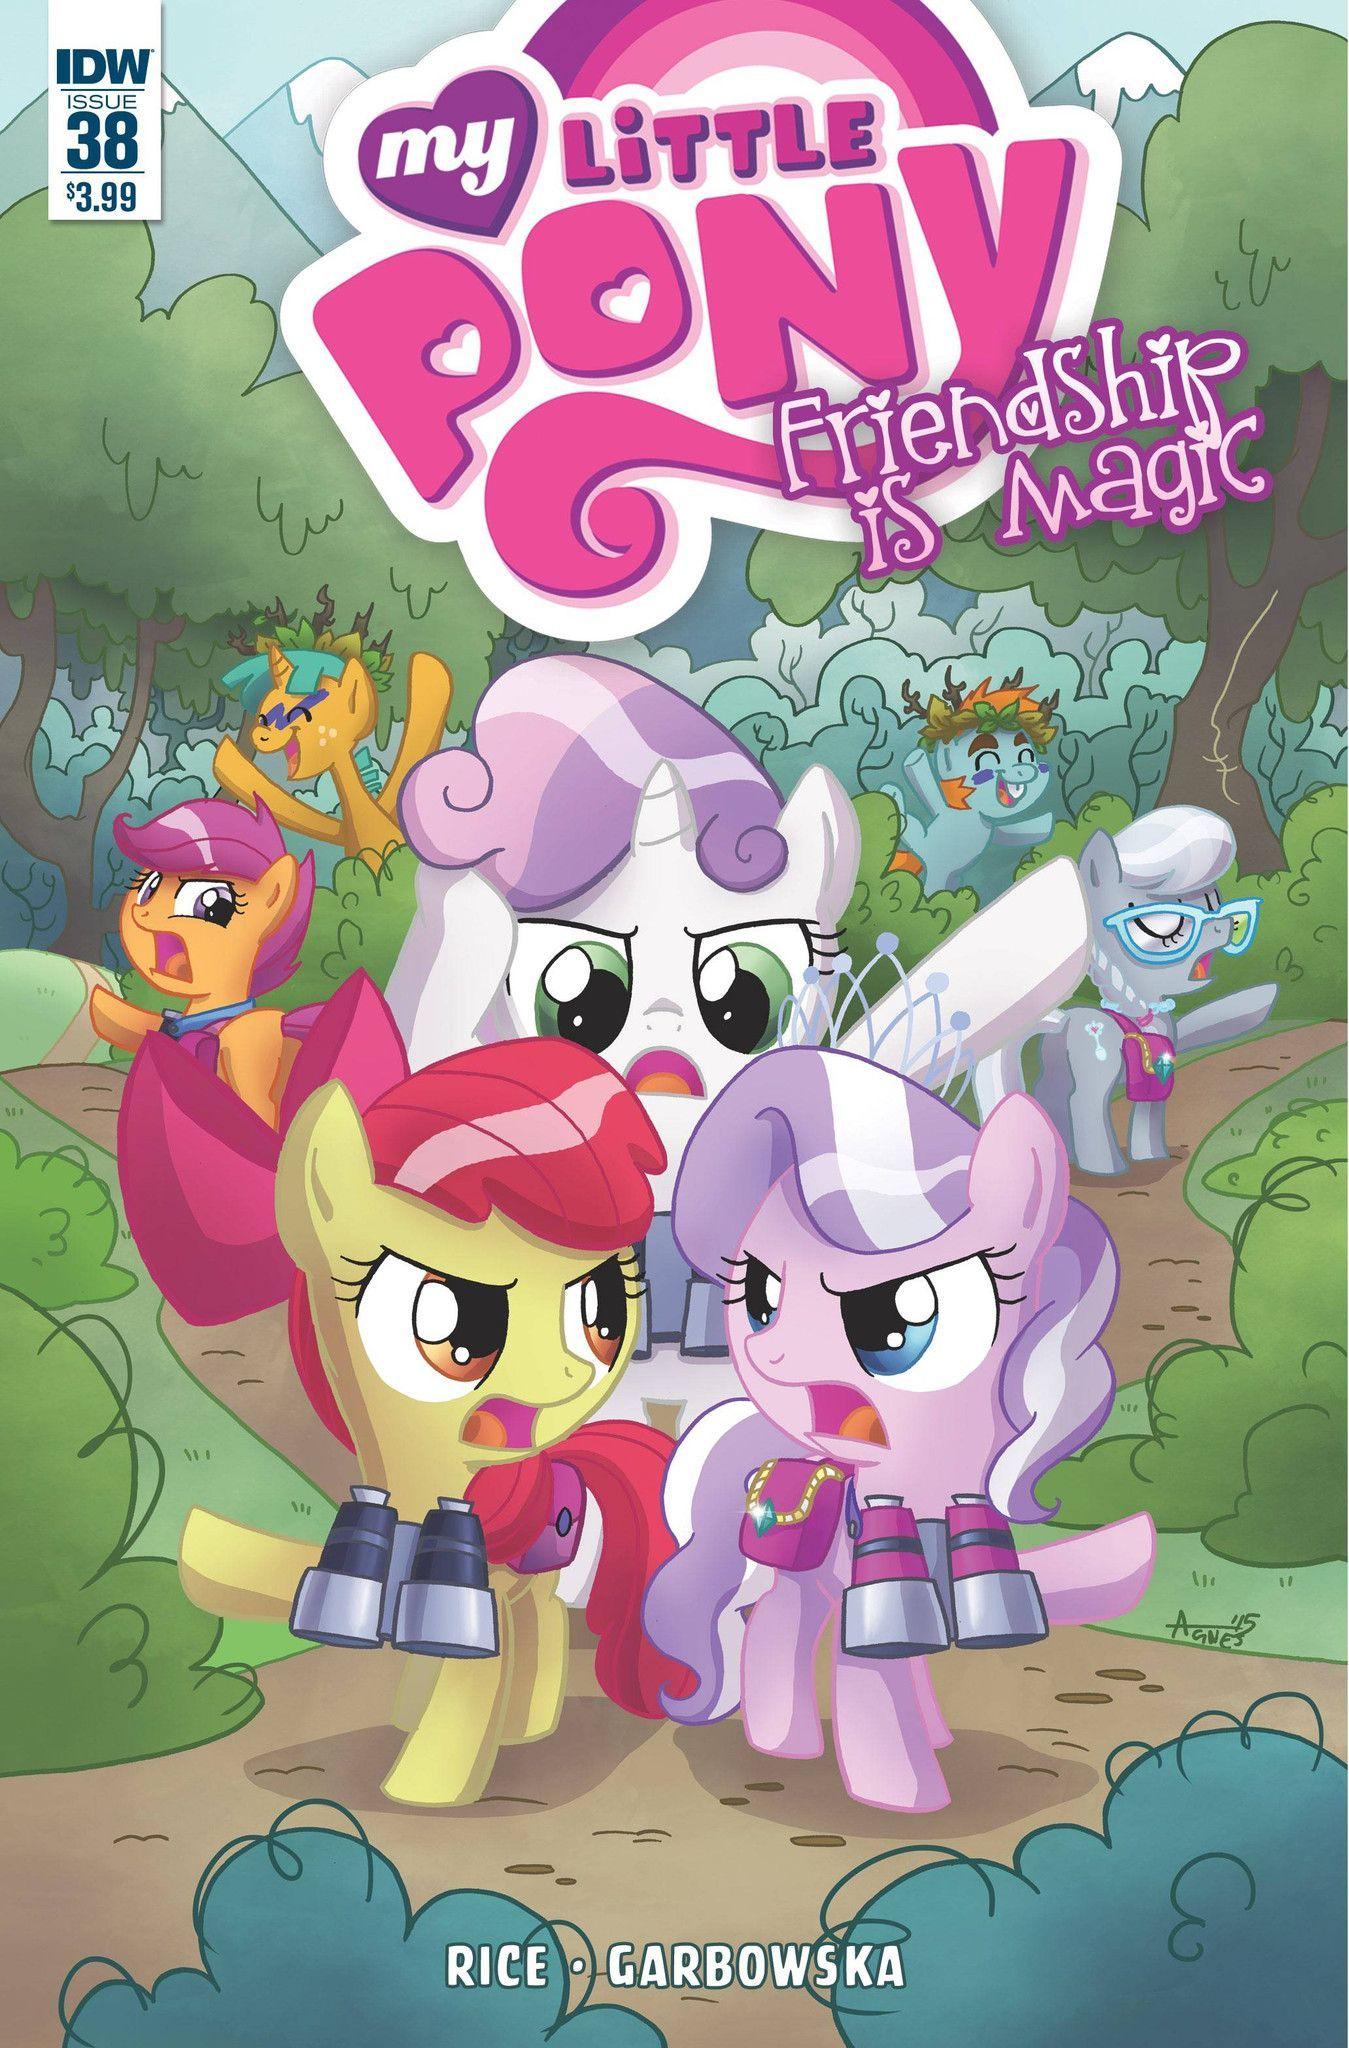 My Little Pony Friendship Is Magic (2012) Issue #38 | Kawaii, Cosas ...